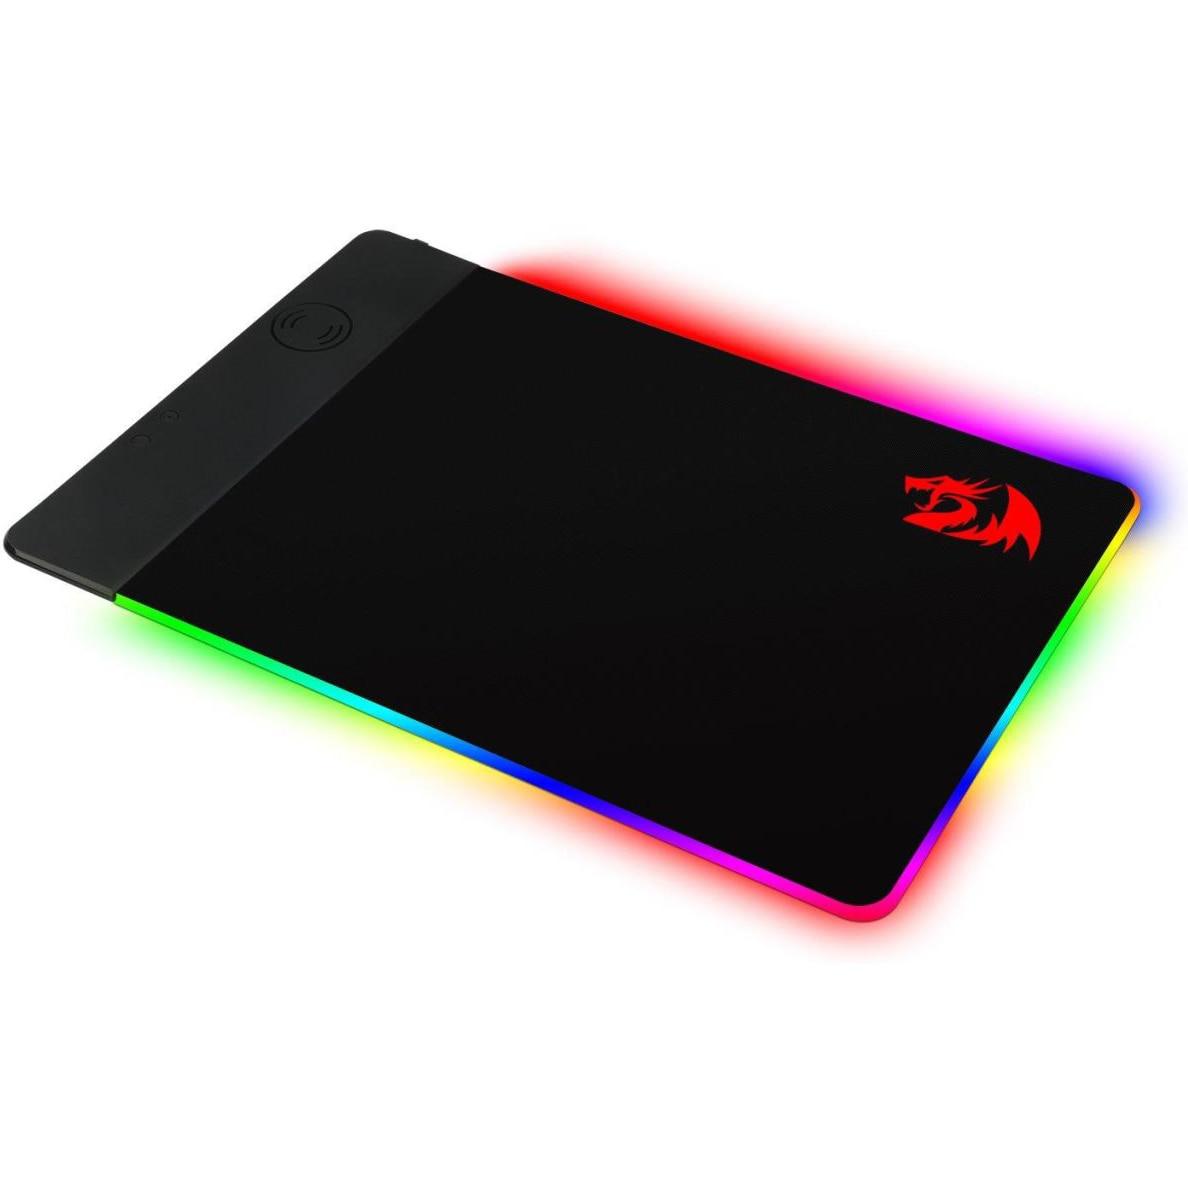 Fotografie Mousepad cu incarcare wireless Qi Redragon, suprafata textil, incarcare Qi 10W, 44x30cm